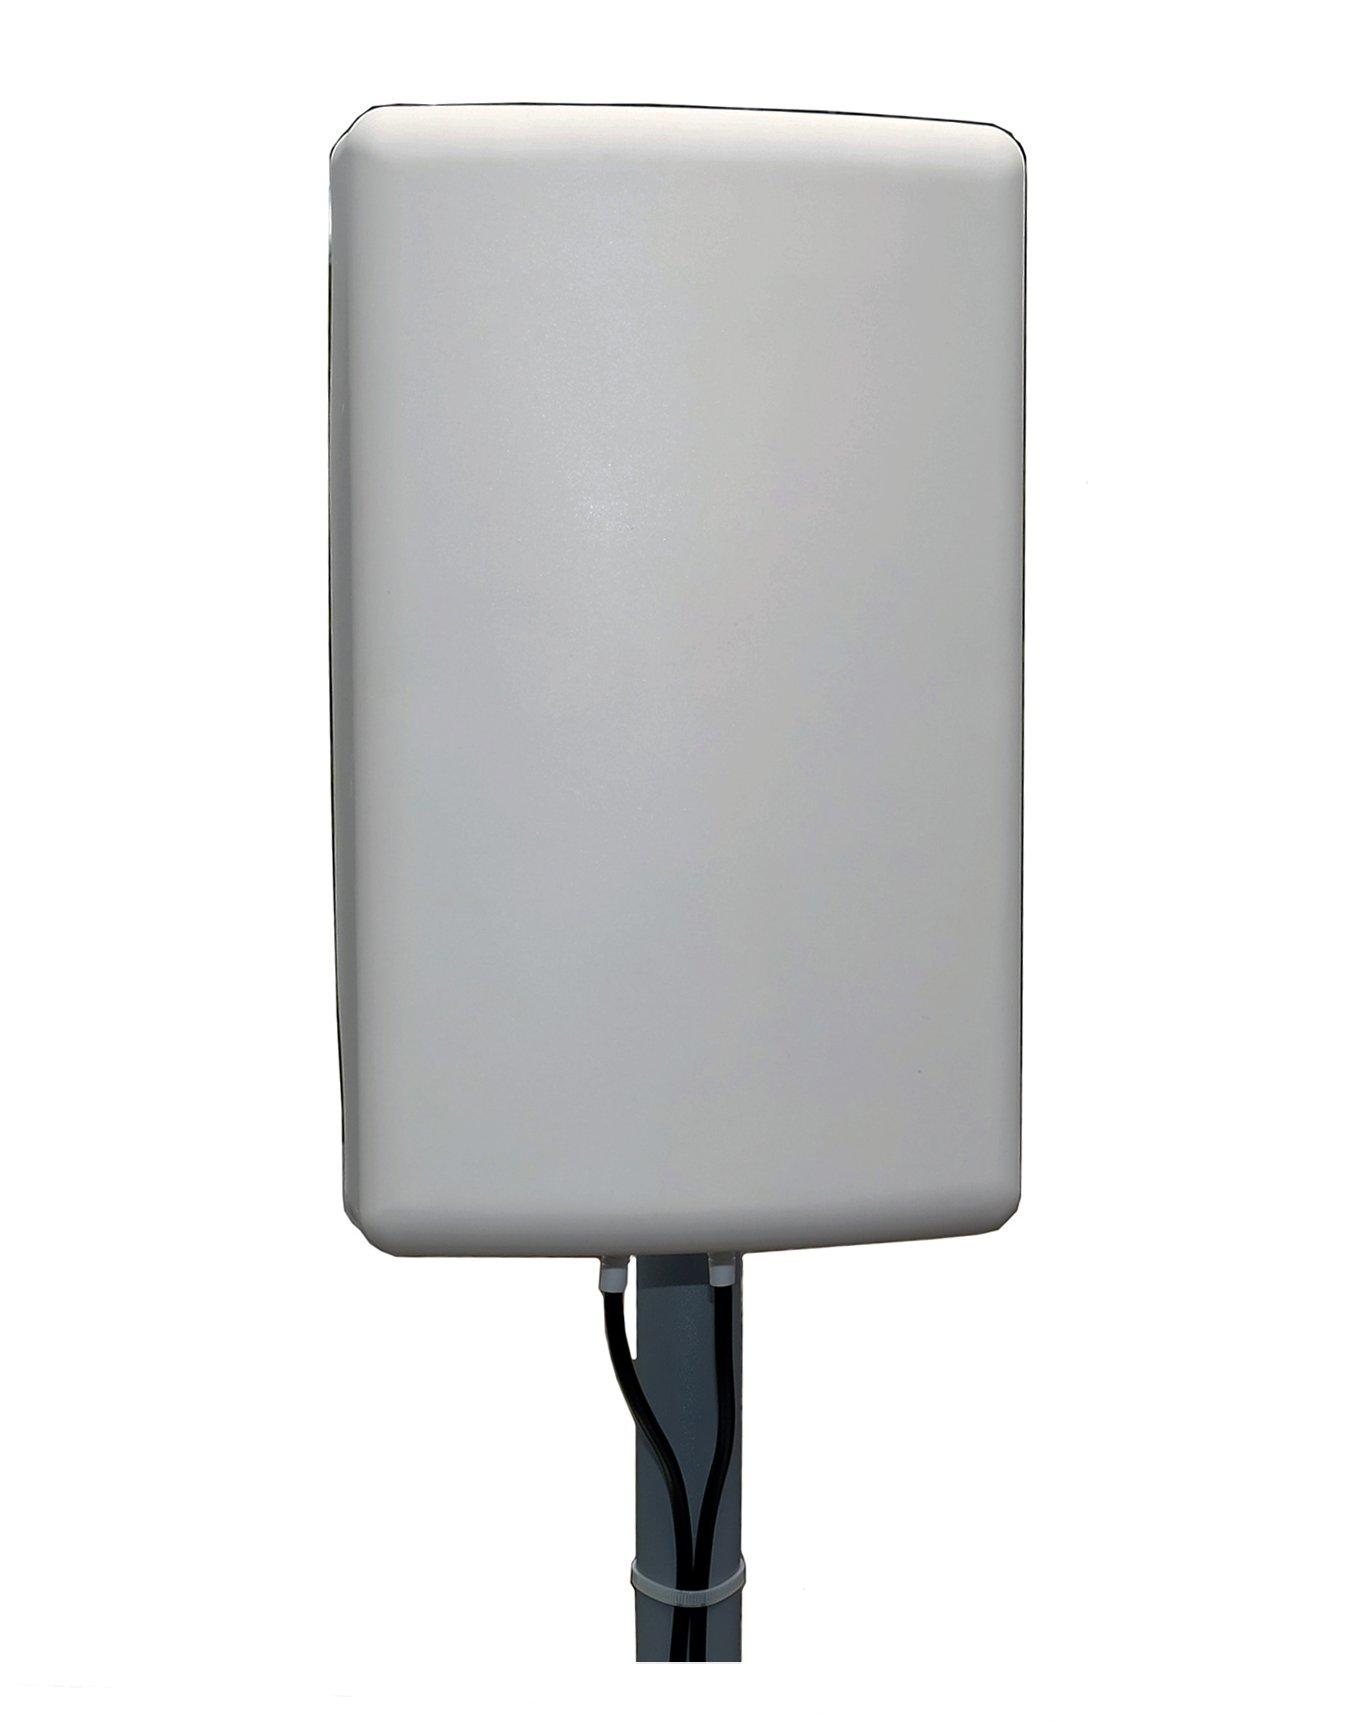 Proxicast 4G / LTE Cross-Polarized (MIMO) 7-10 dBi High-Gain